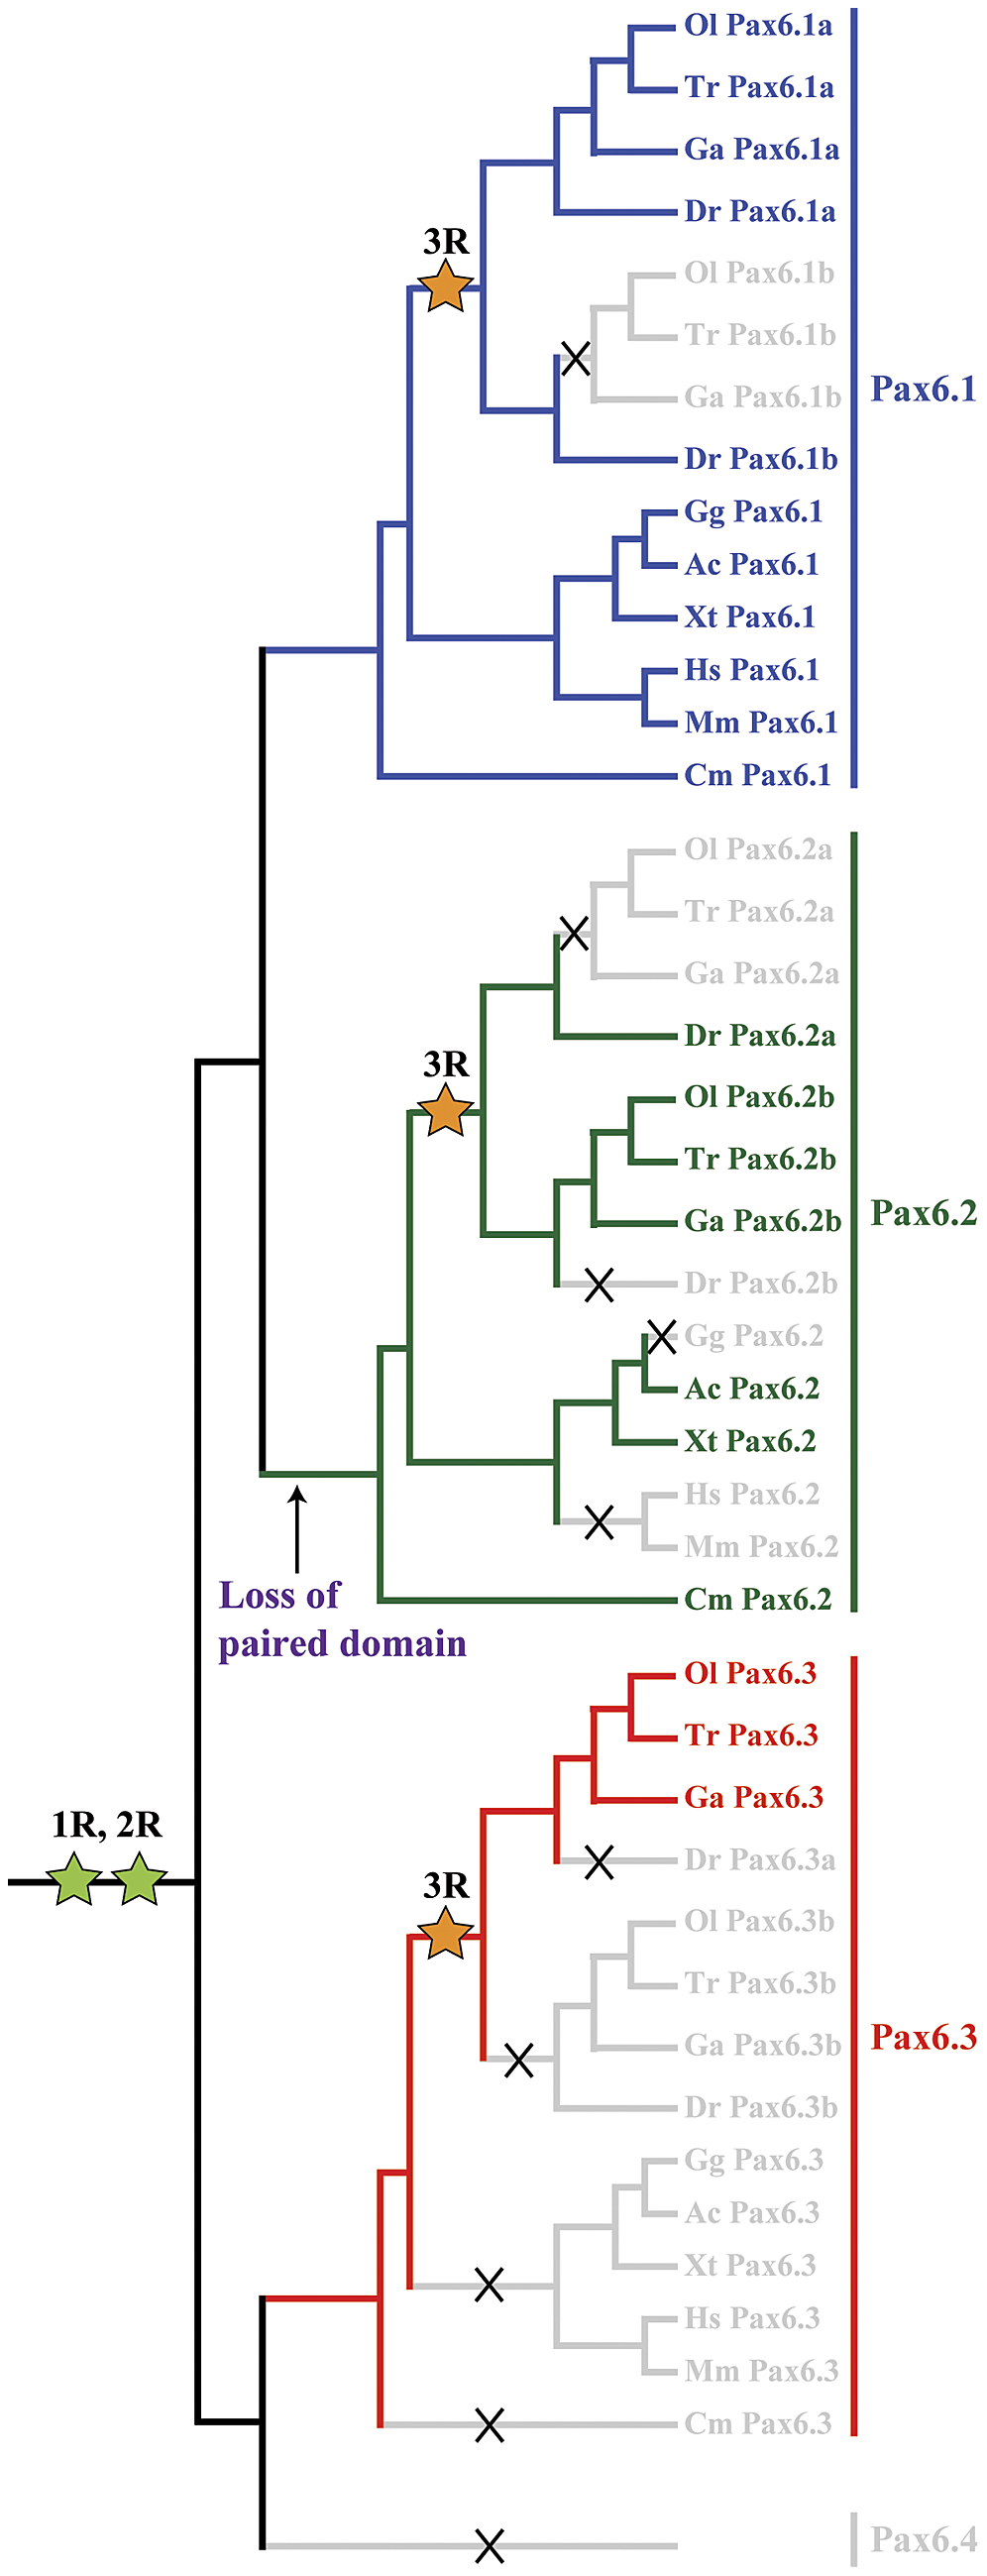 Evolutionary history of the <i>Pax6</i> gene family in vertebrates.